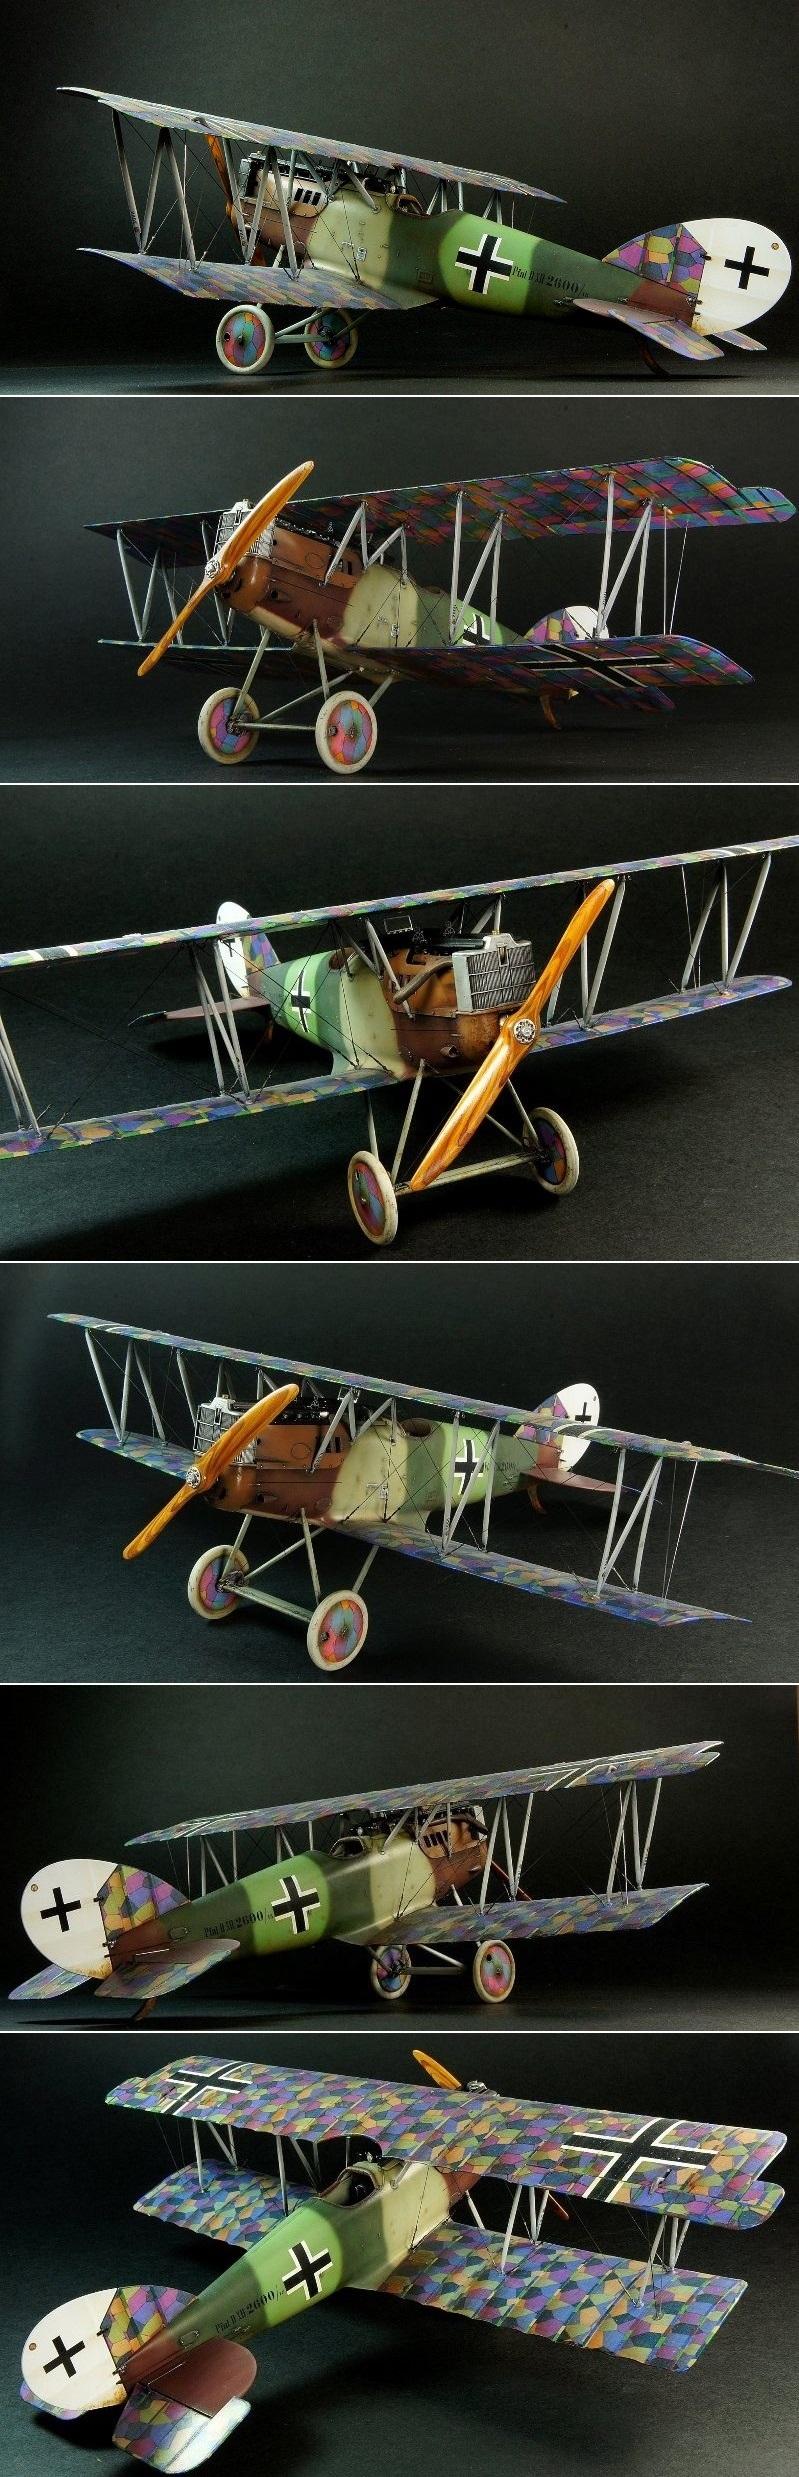 Pfalz D Xii Wingnut Wings 1 32 Http Www Network54 Com Forum 47751 Message 1431961688 Pfalz D Xii Wingnut Wi Model Airplanes Aircraft Modeling Scale Models